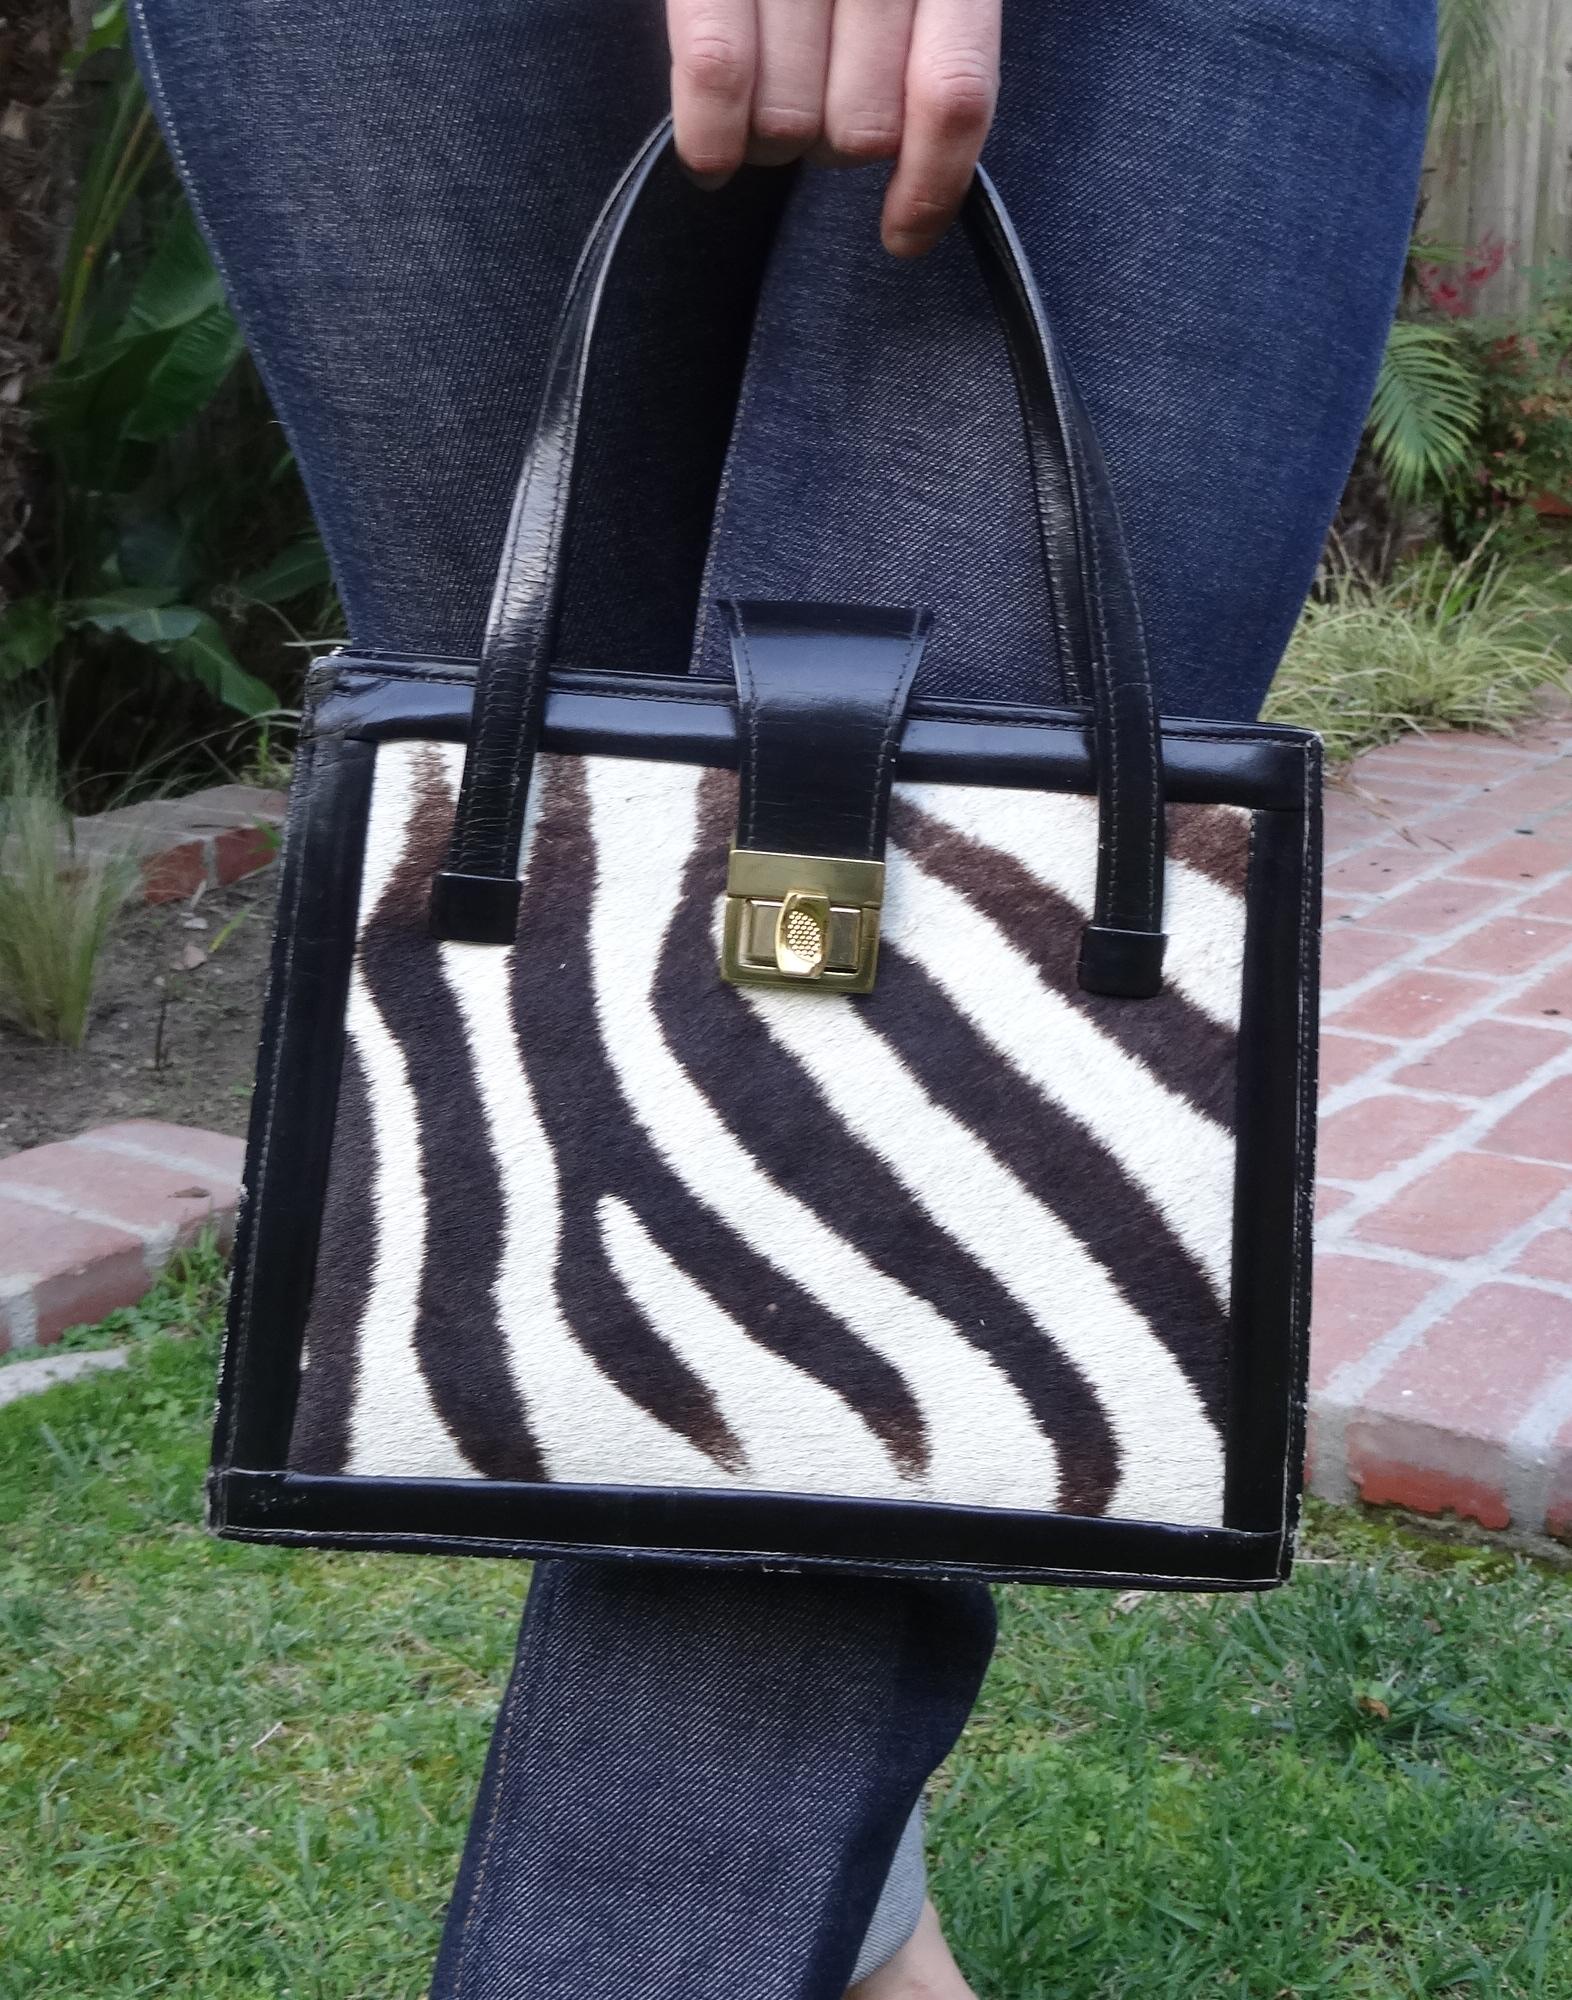 Vintage leather and zebra hair handbag